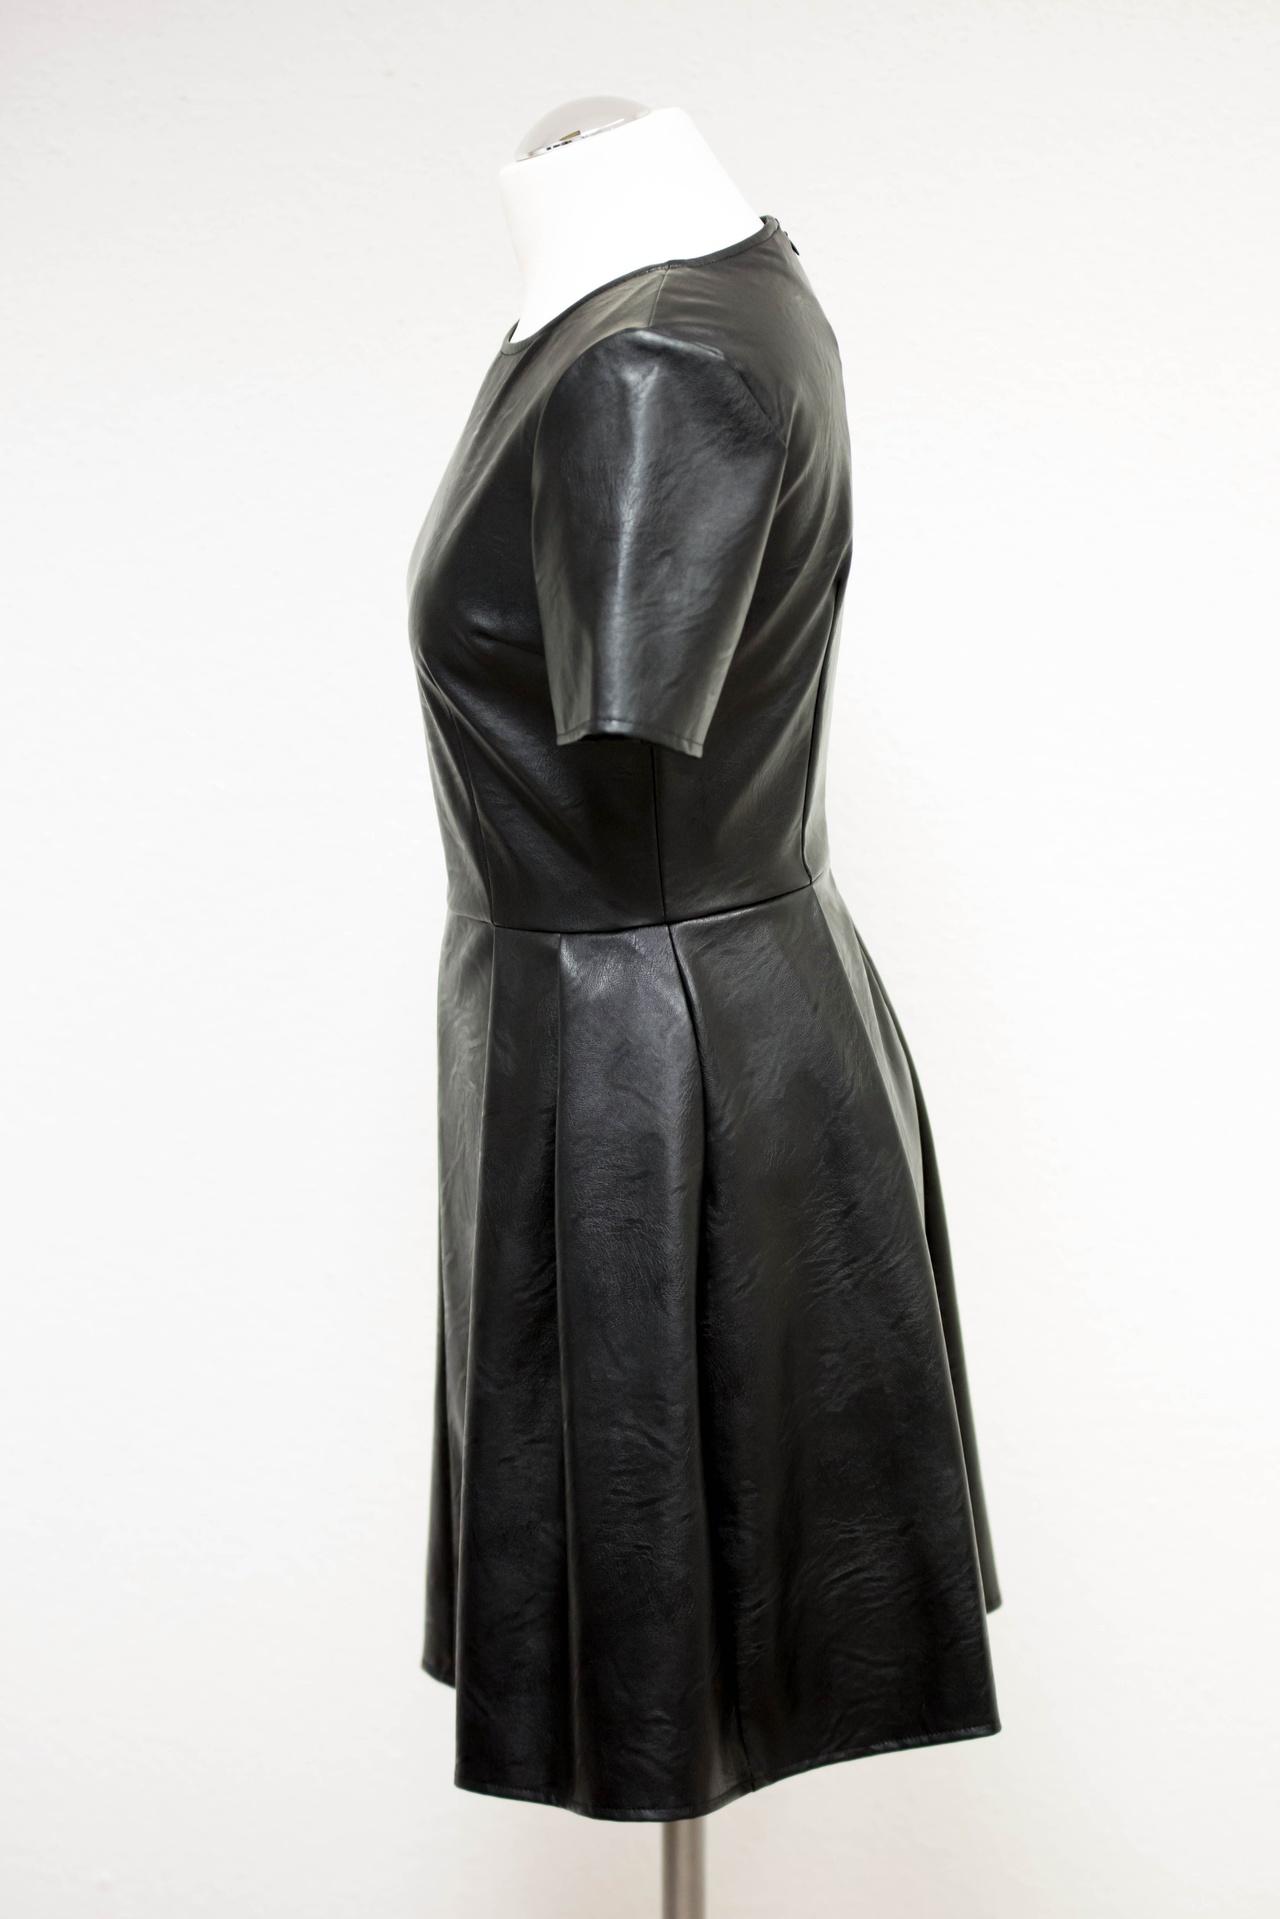 Lederkleid Imperial Fashion Lederkleid Imperial Fashion 33 01